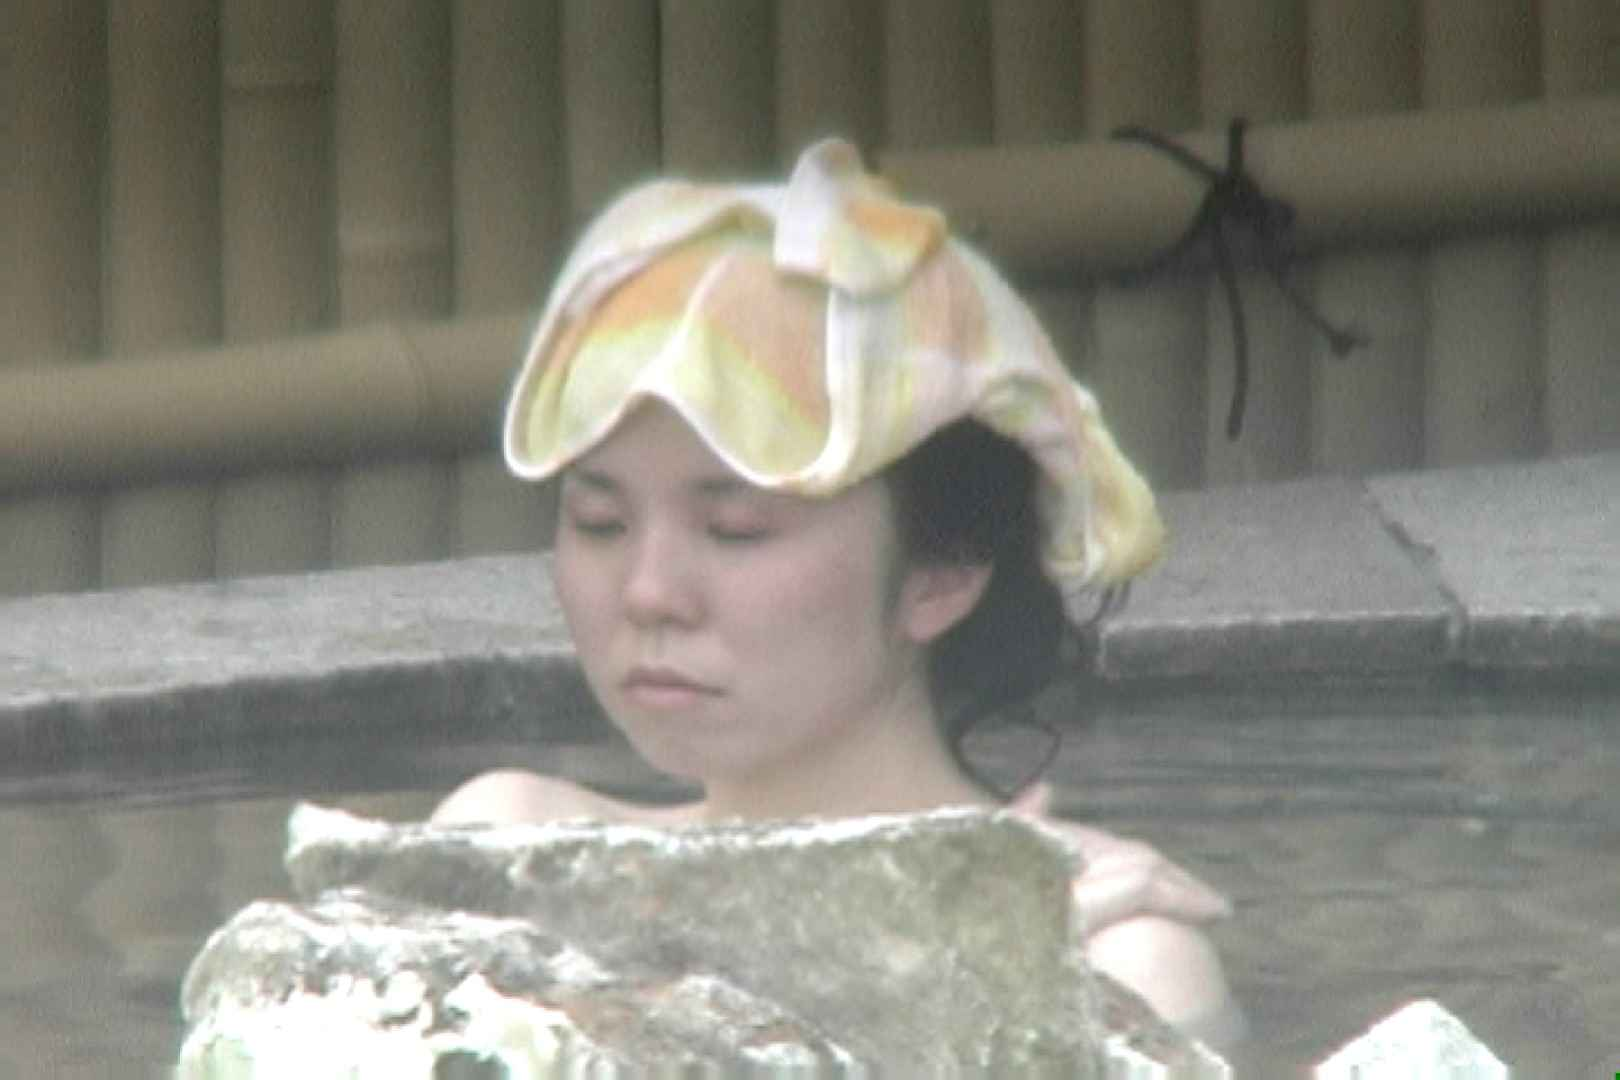 Aquaな露天風呂Vol.687 露天 隠し撮りオマンコ動画紹介 63画像 47